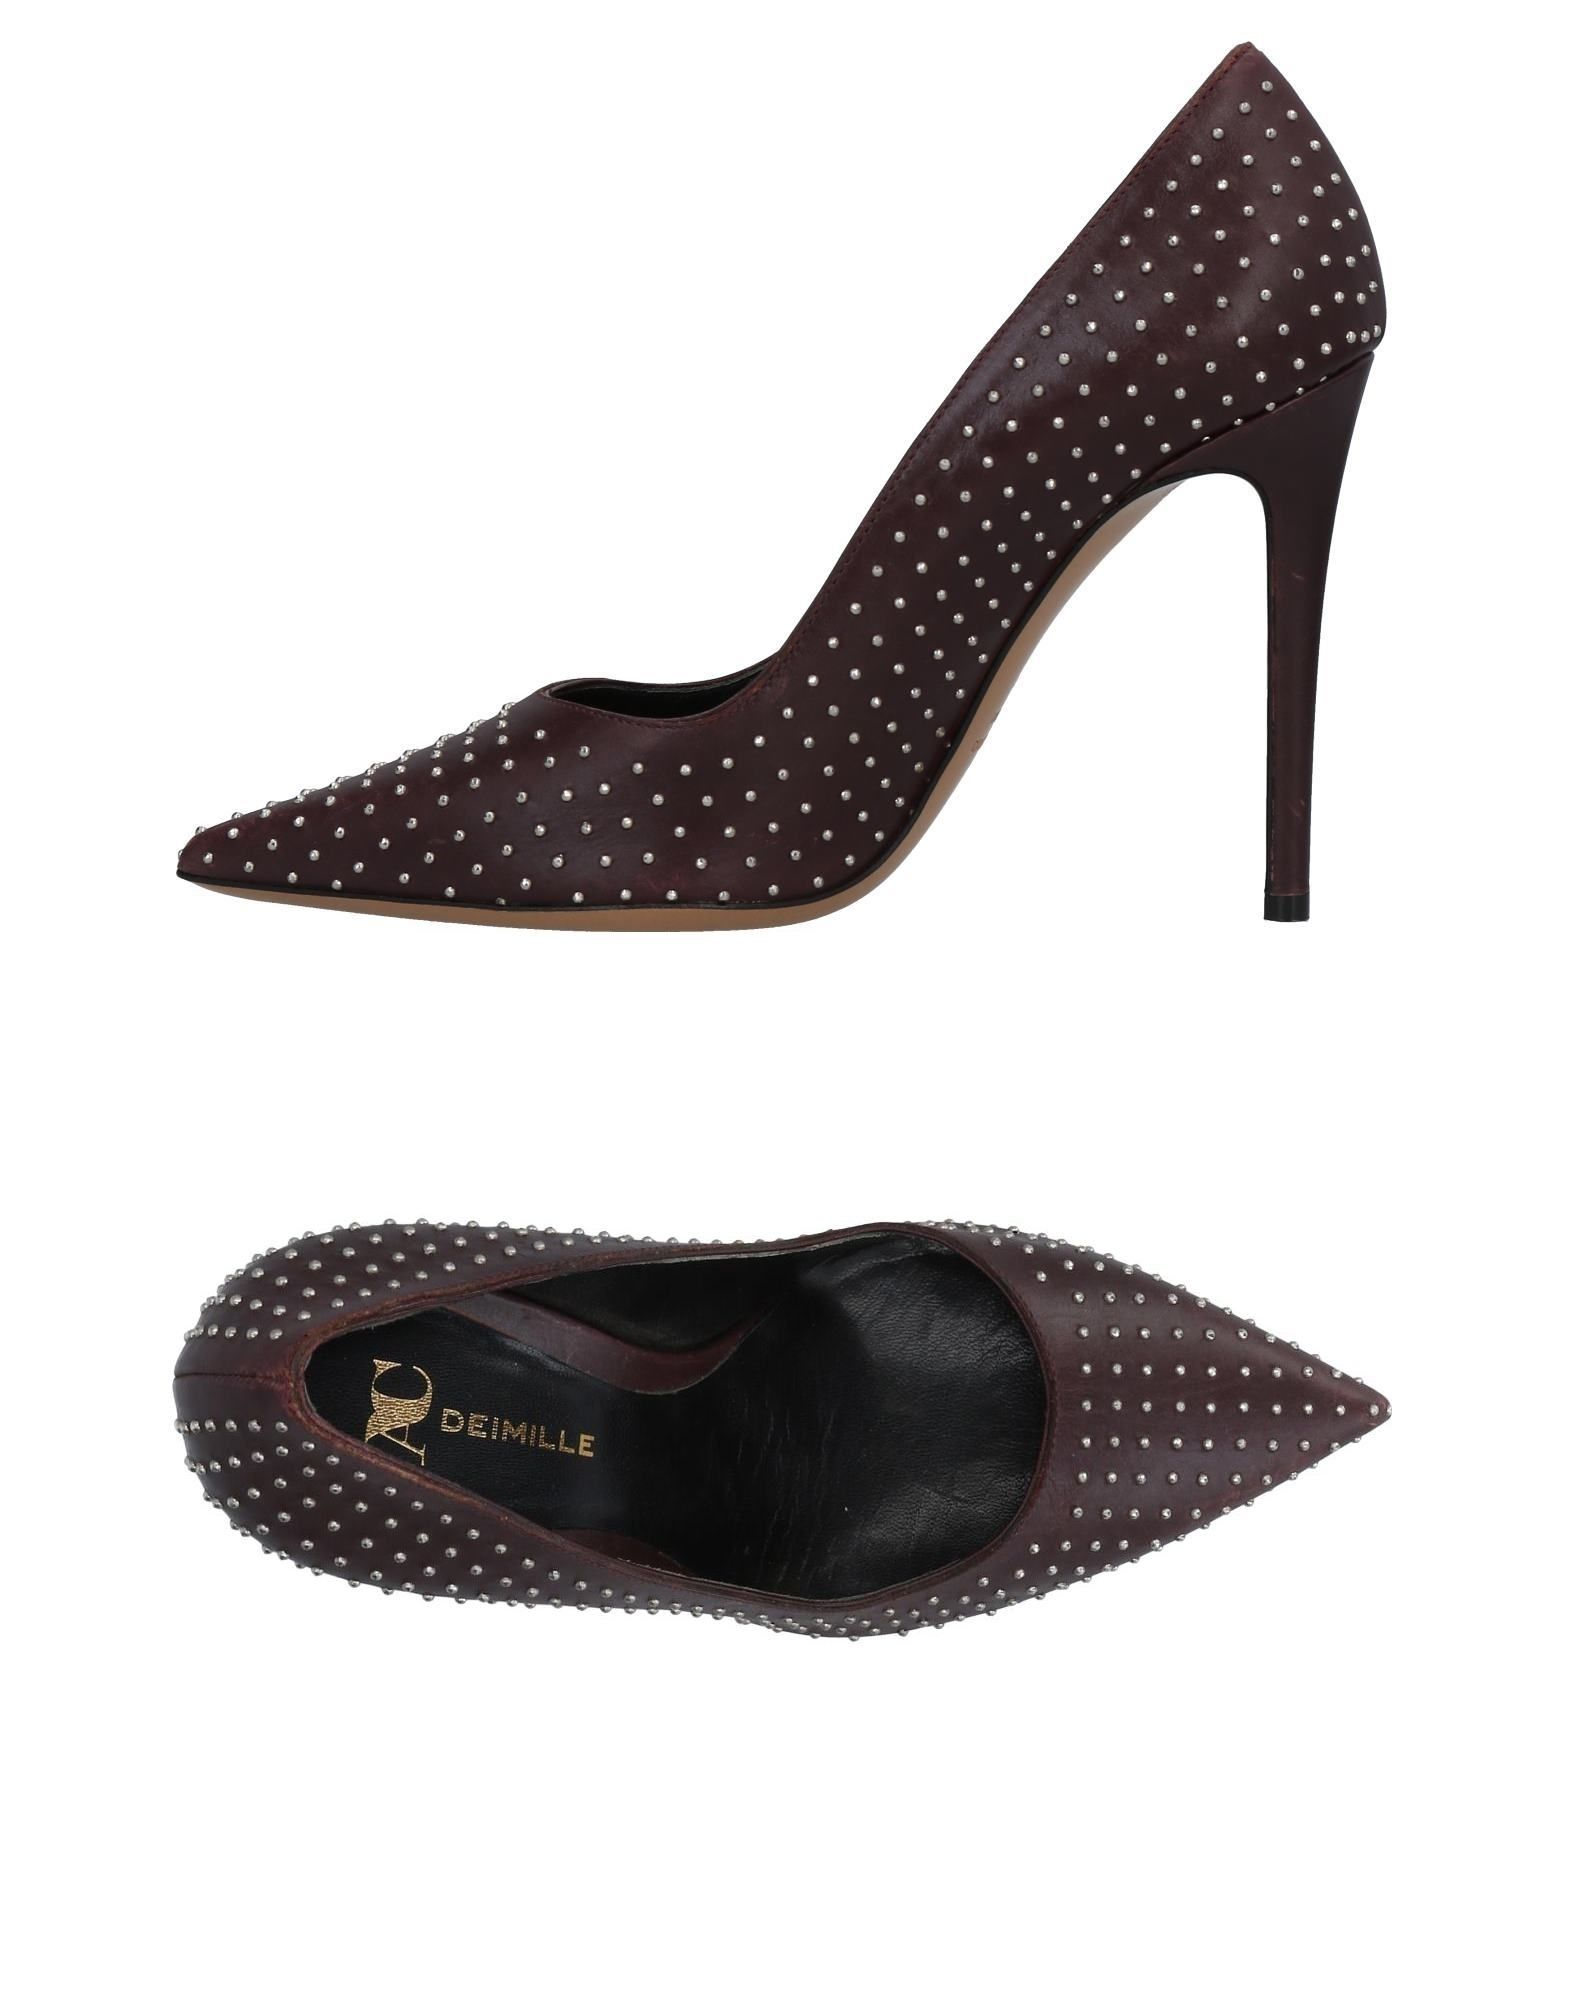 Deimille Gute Pumps Damen  11480775EV Gute Deimille Qualität beliebte Schuhe 4b1117